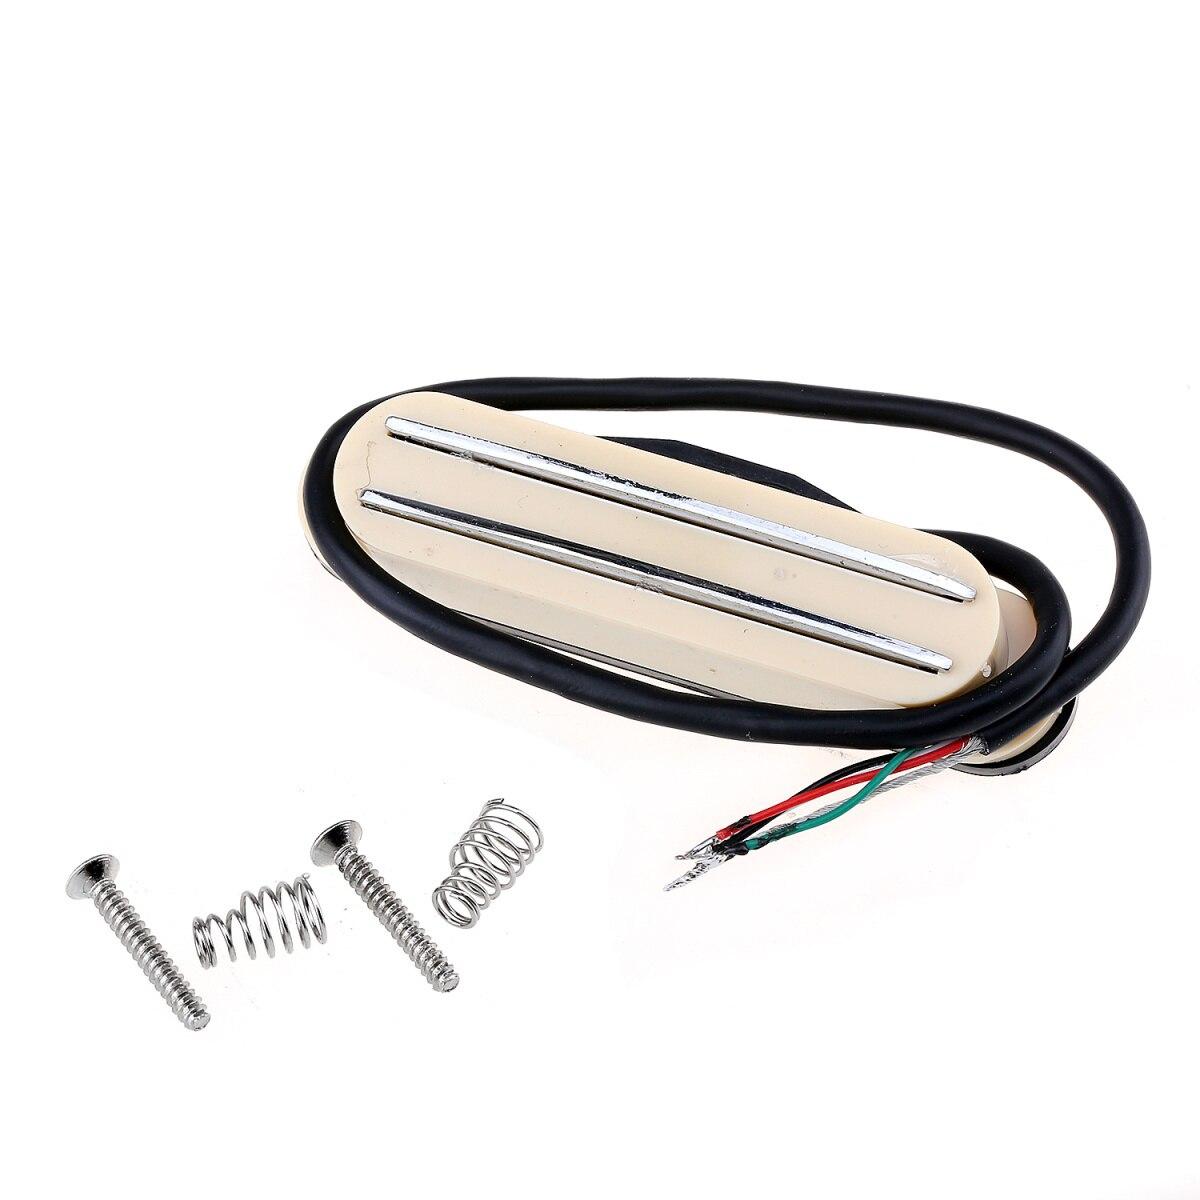 Musiclily Hot Rail doble guitarra de alta salida sola bobina tamaño Humbucker...